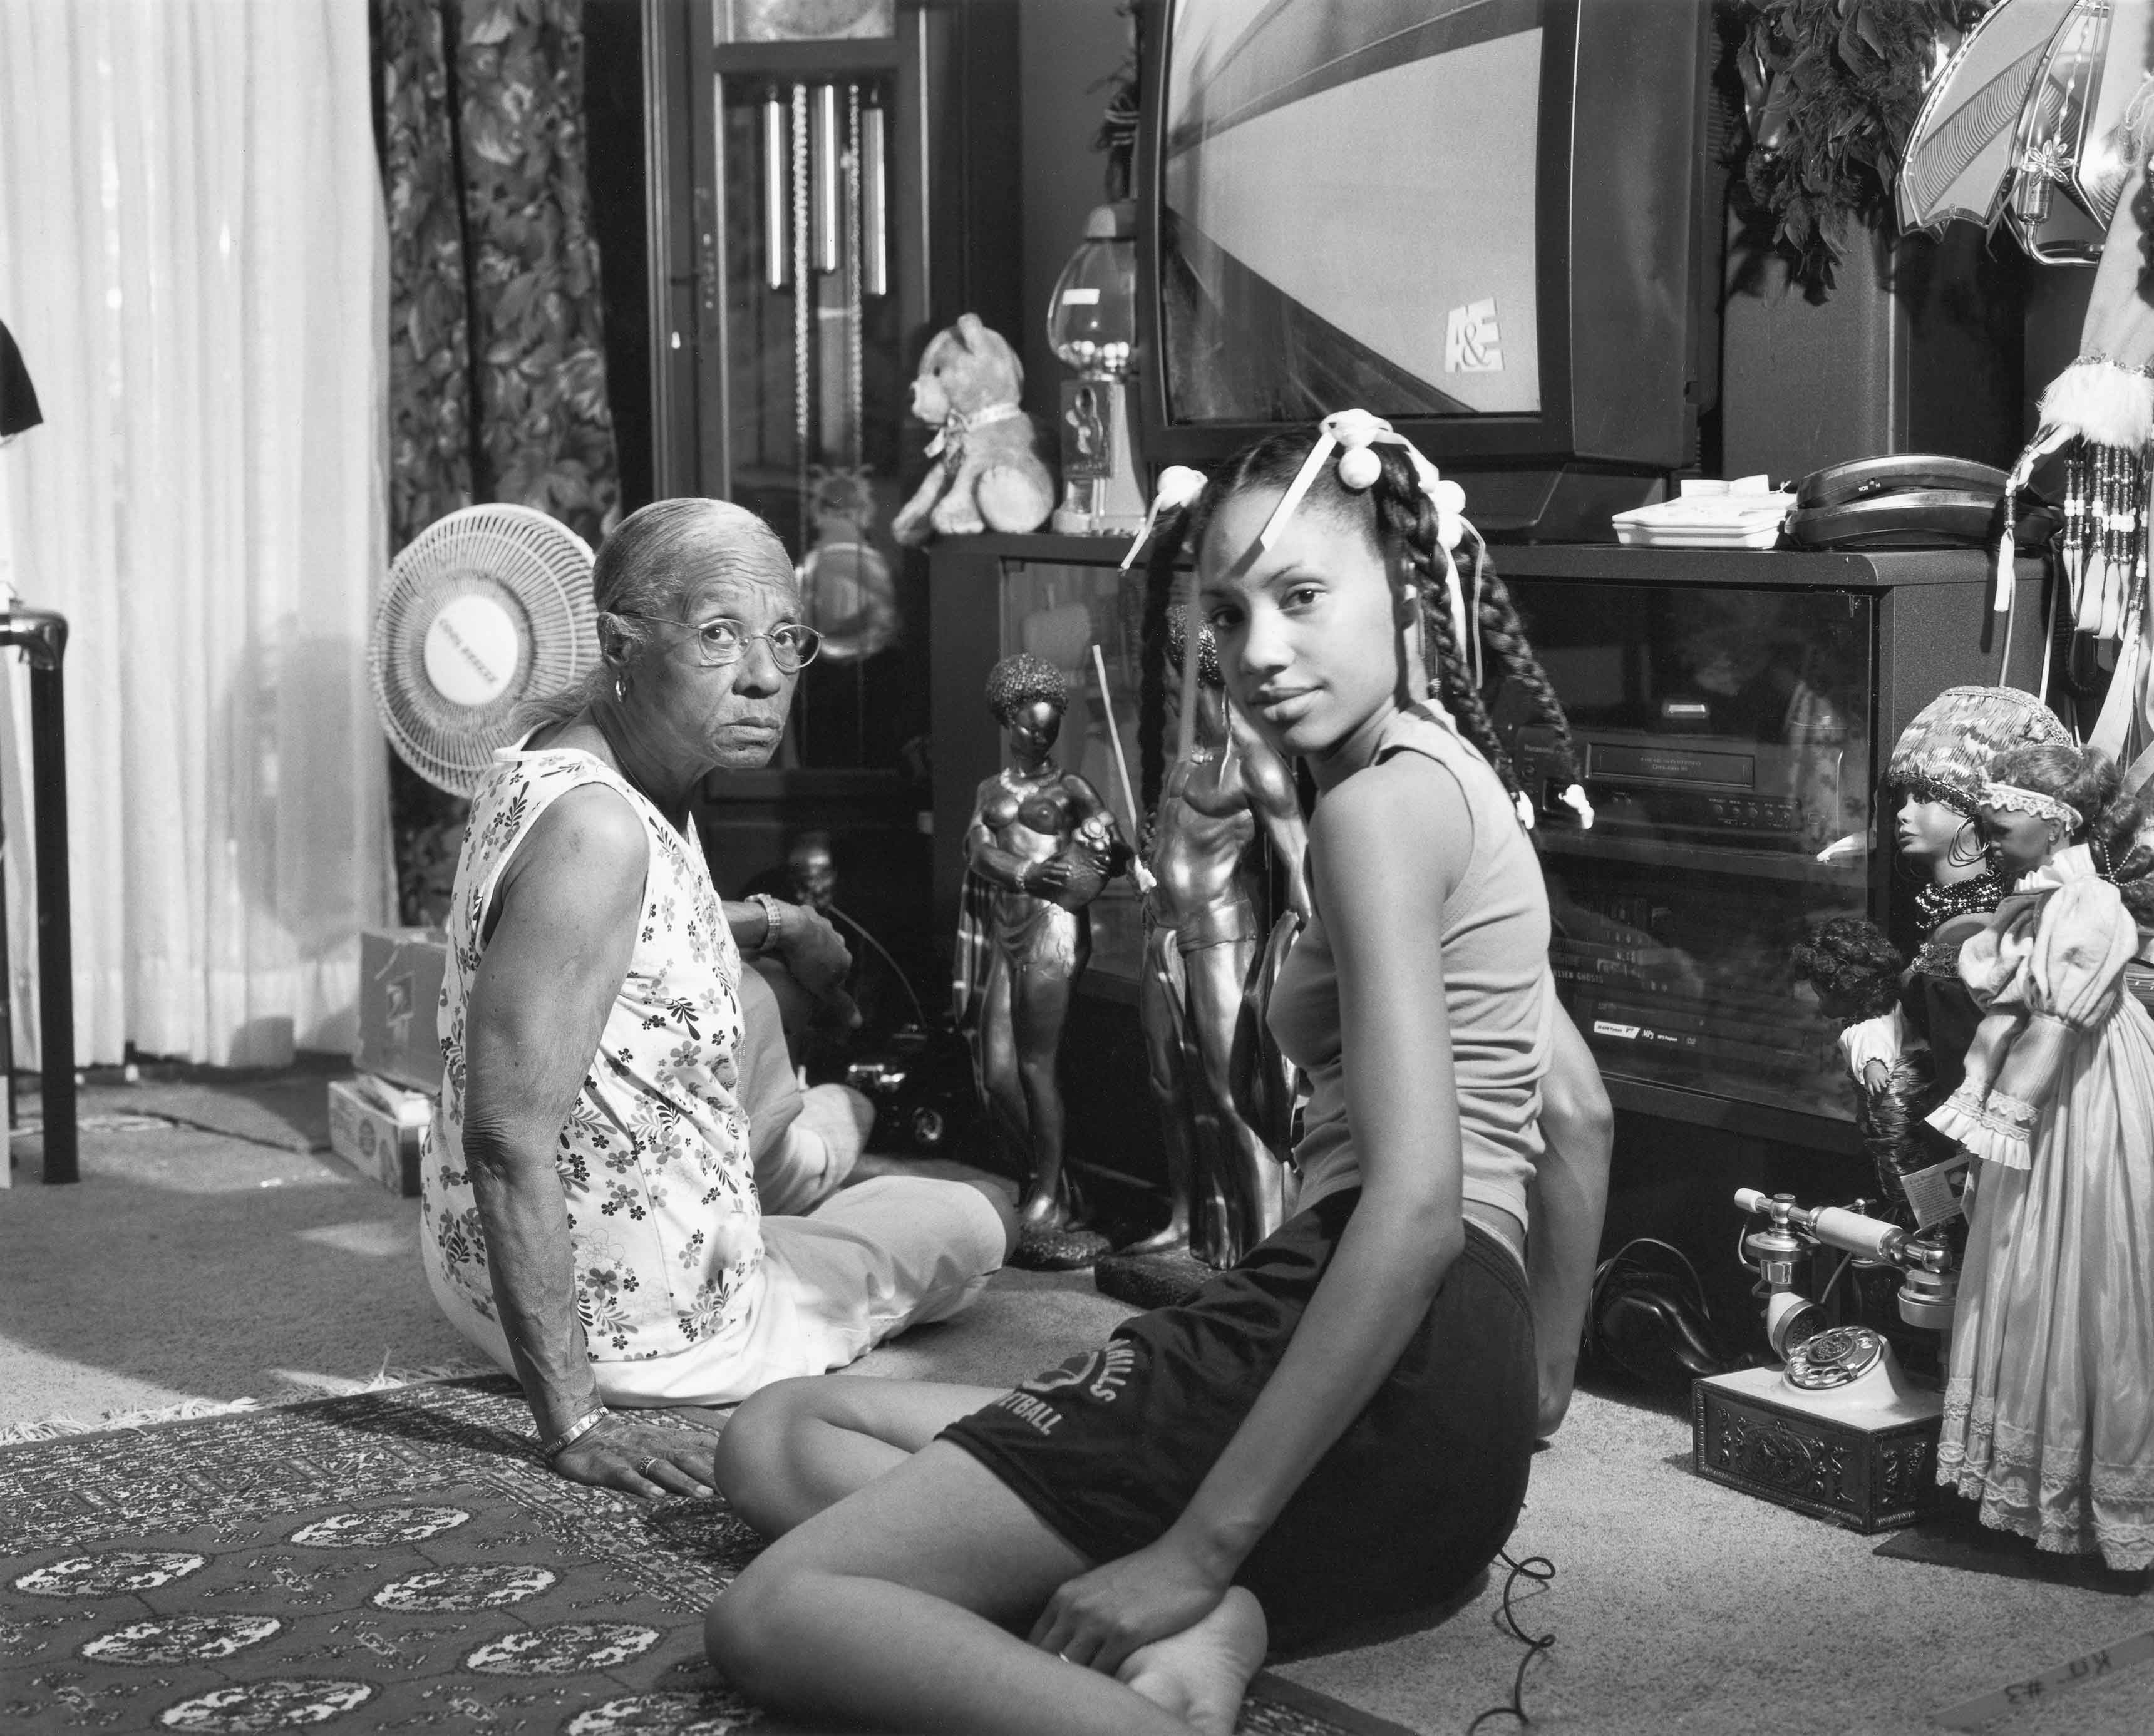 Grandma Ruby and Me, 2005. Latoya Ruby Frazier